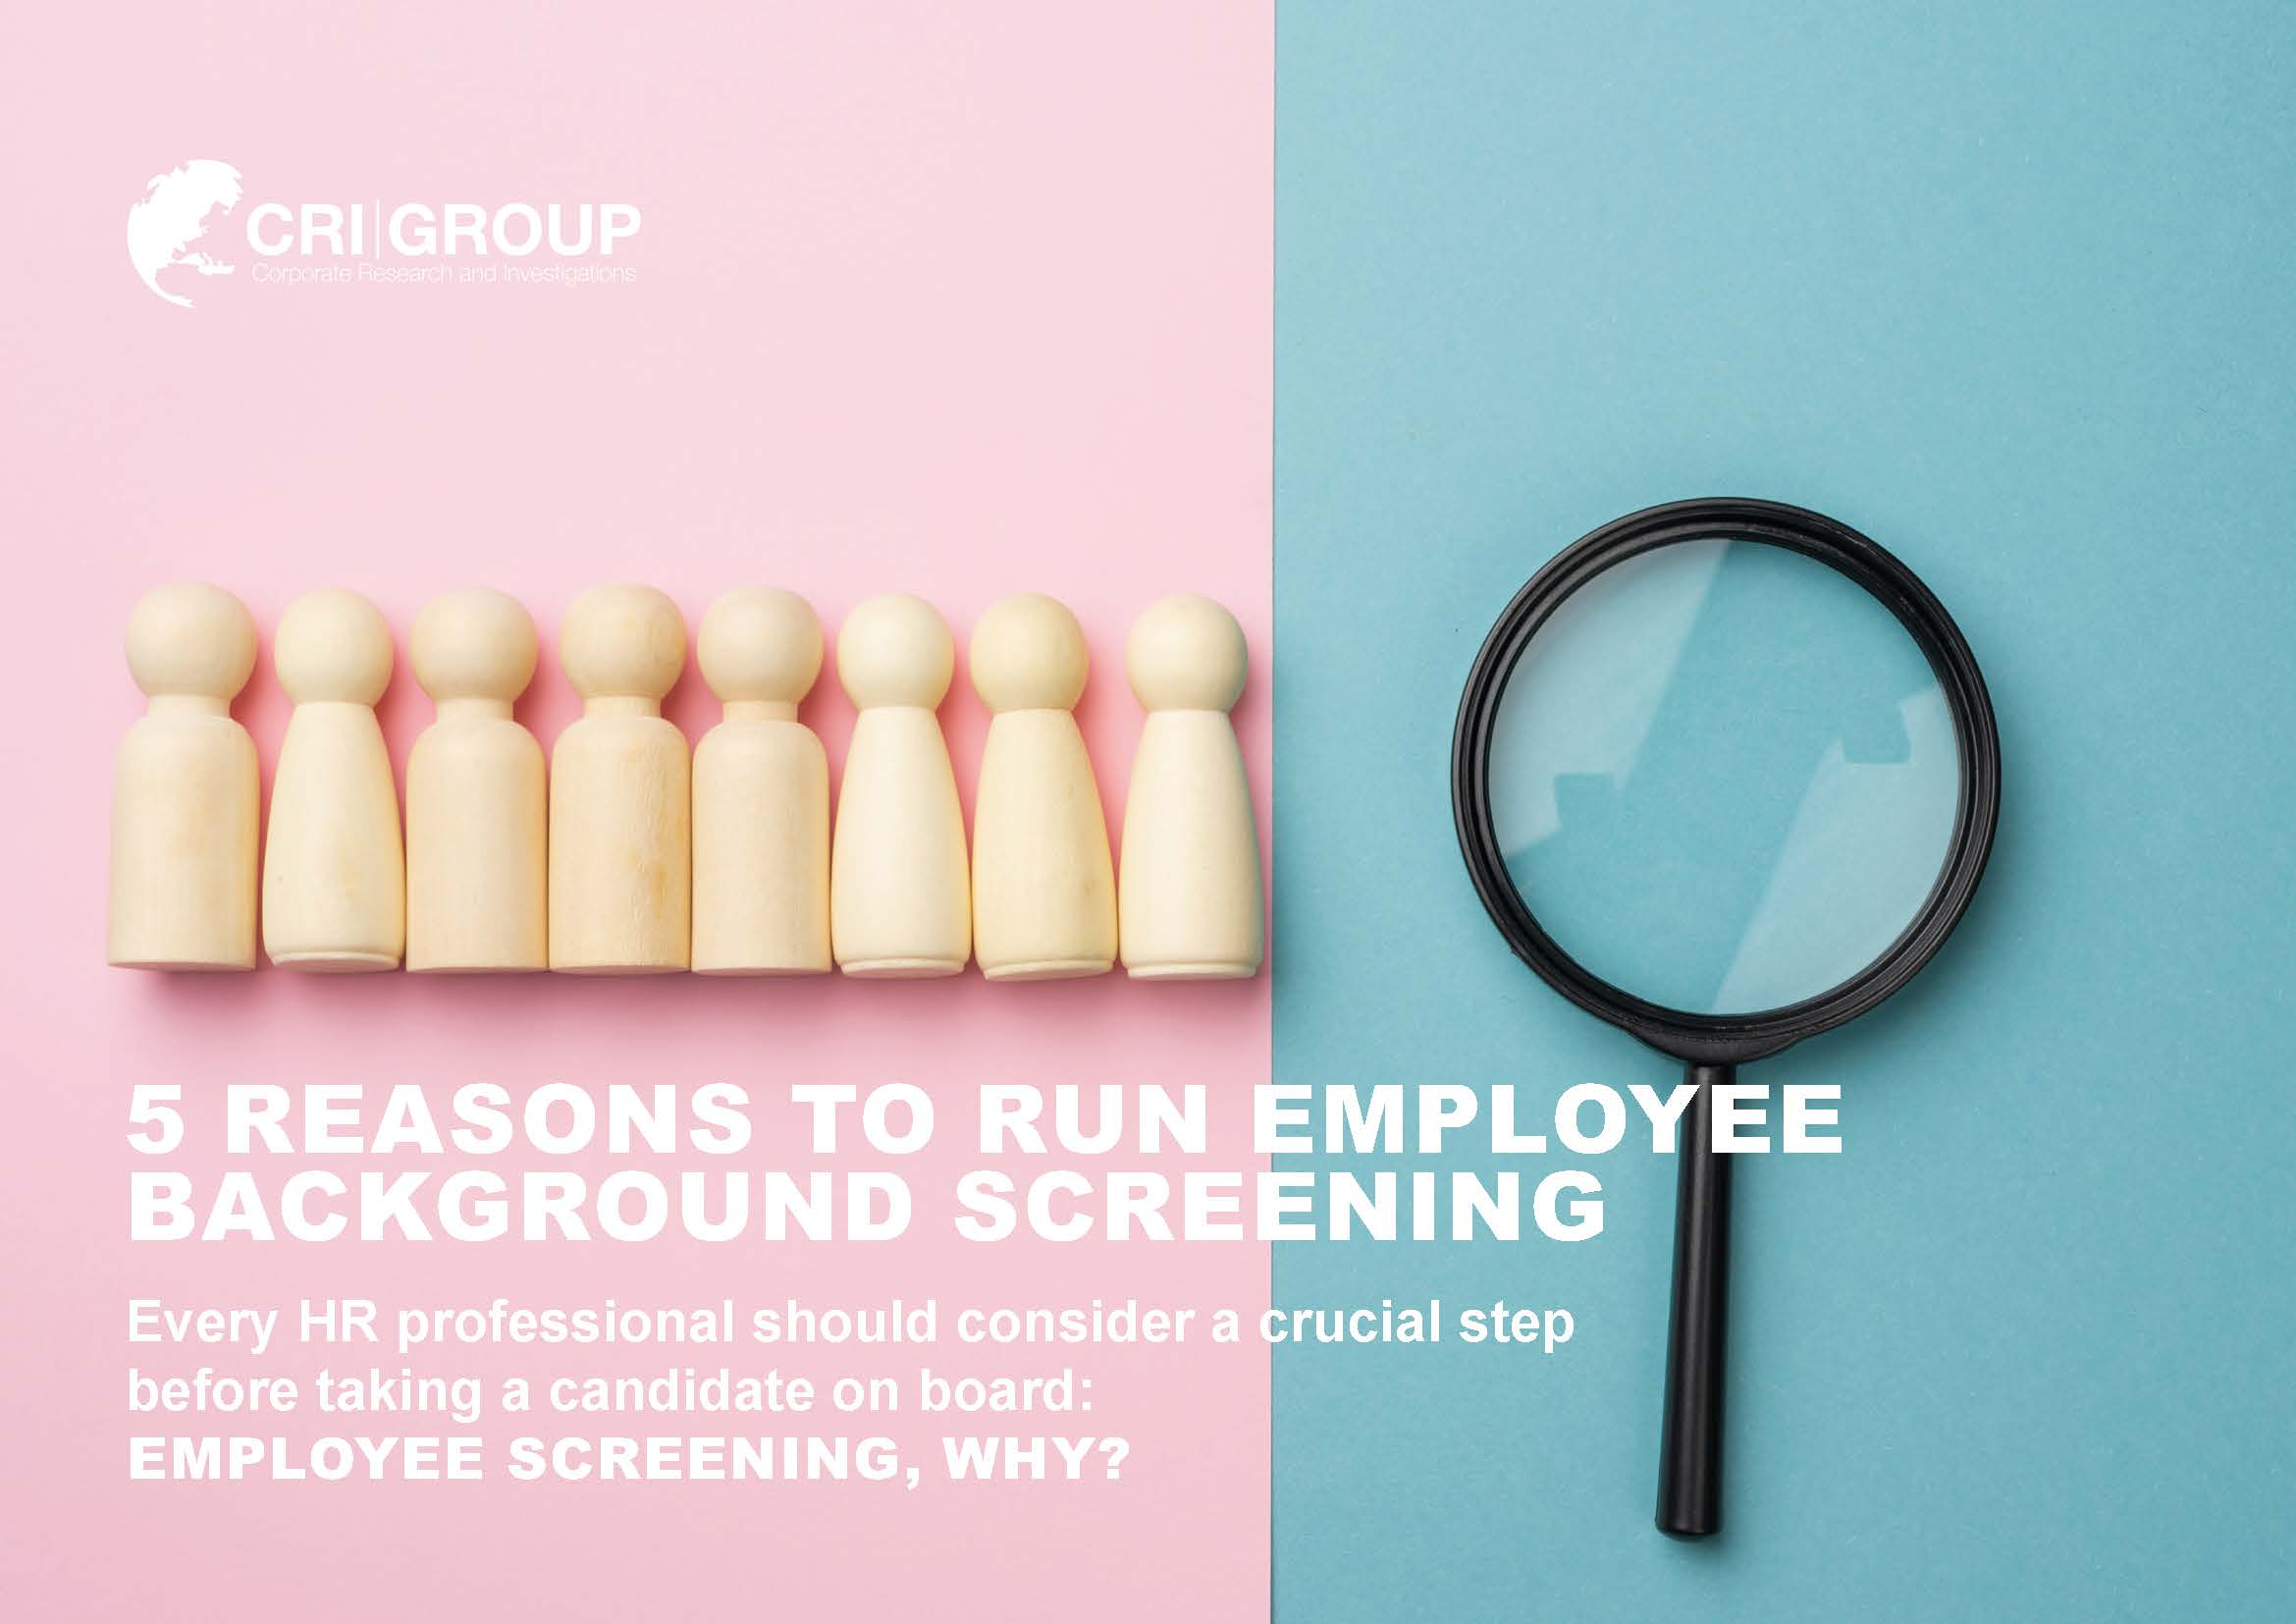 5 Reasons To Run Employee Screening